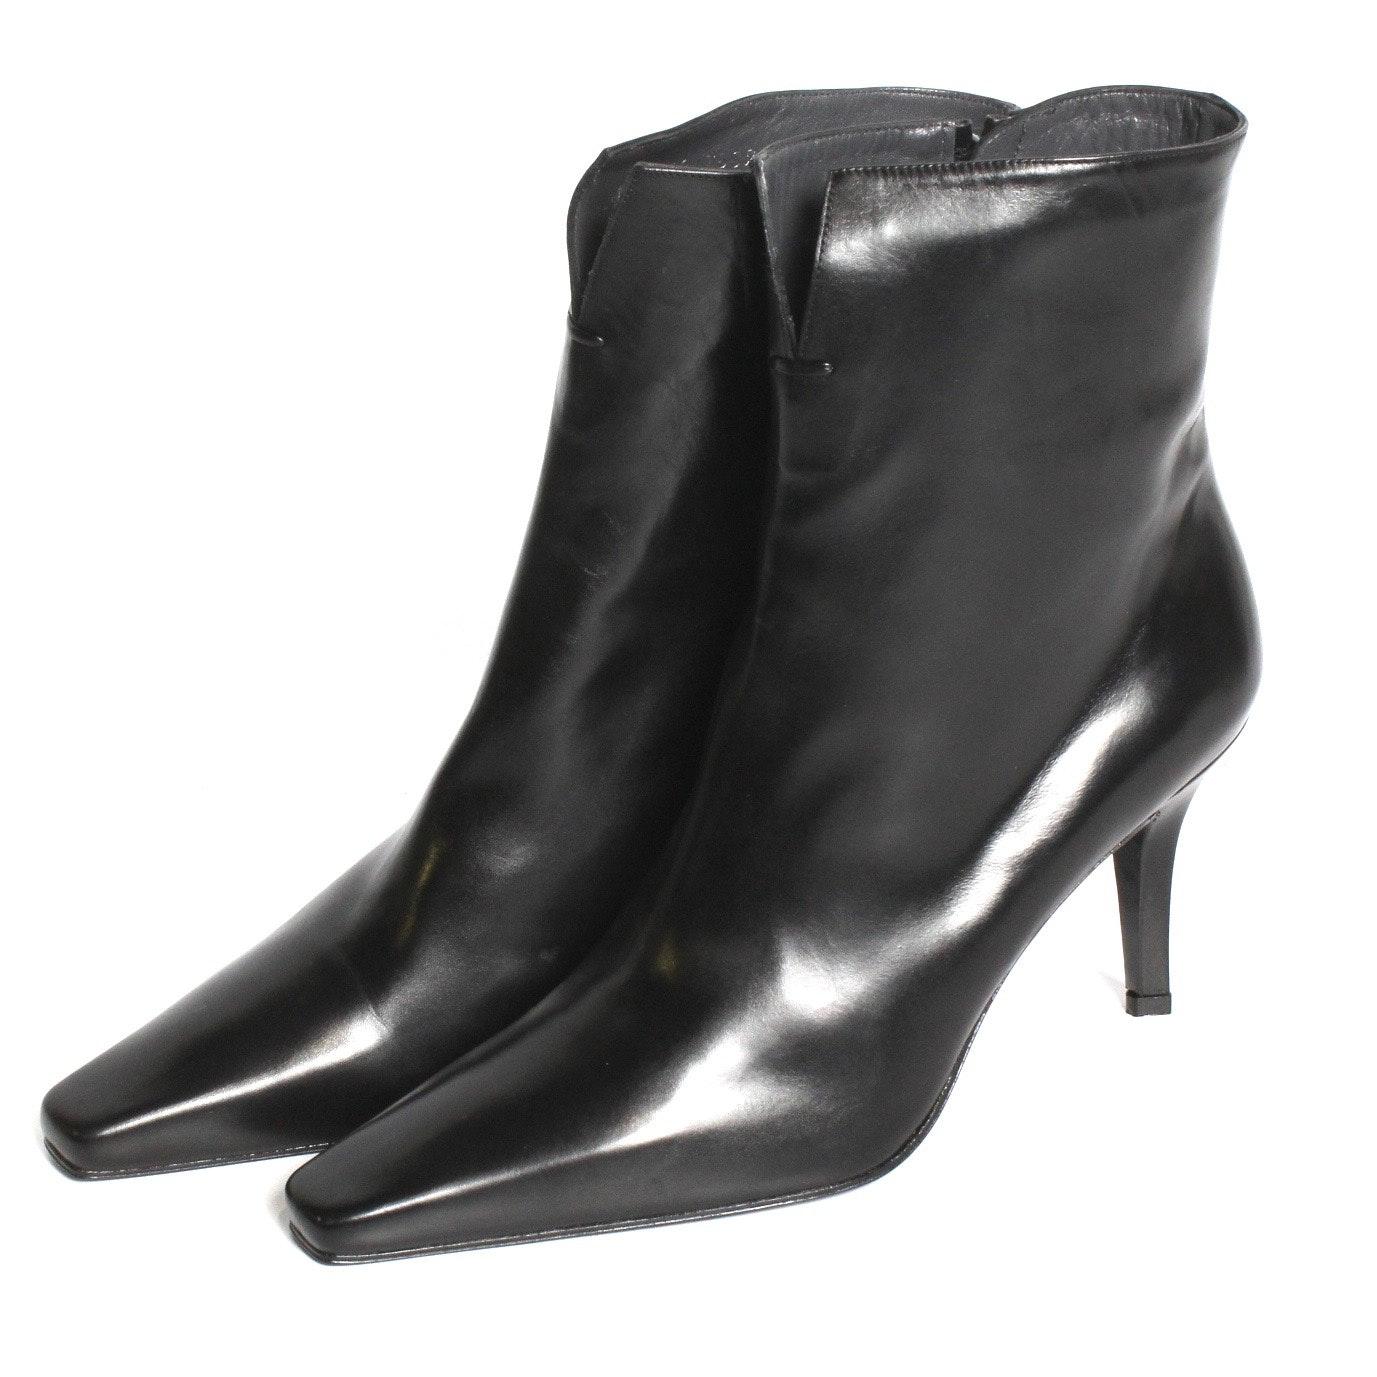 Women's Stuart Weitzman Miss Ankle Boots